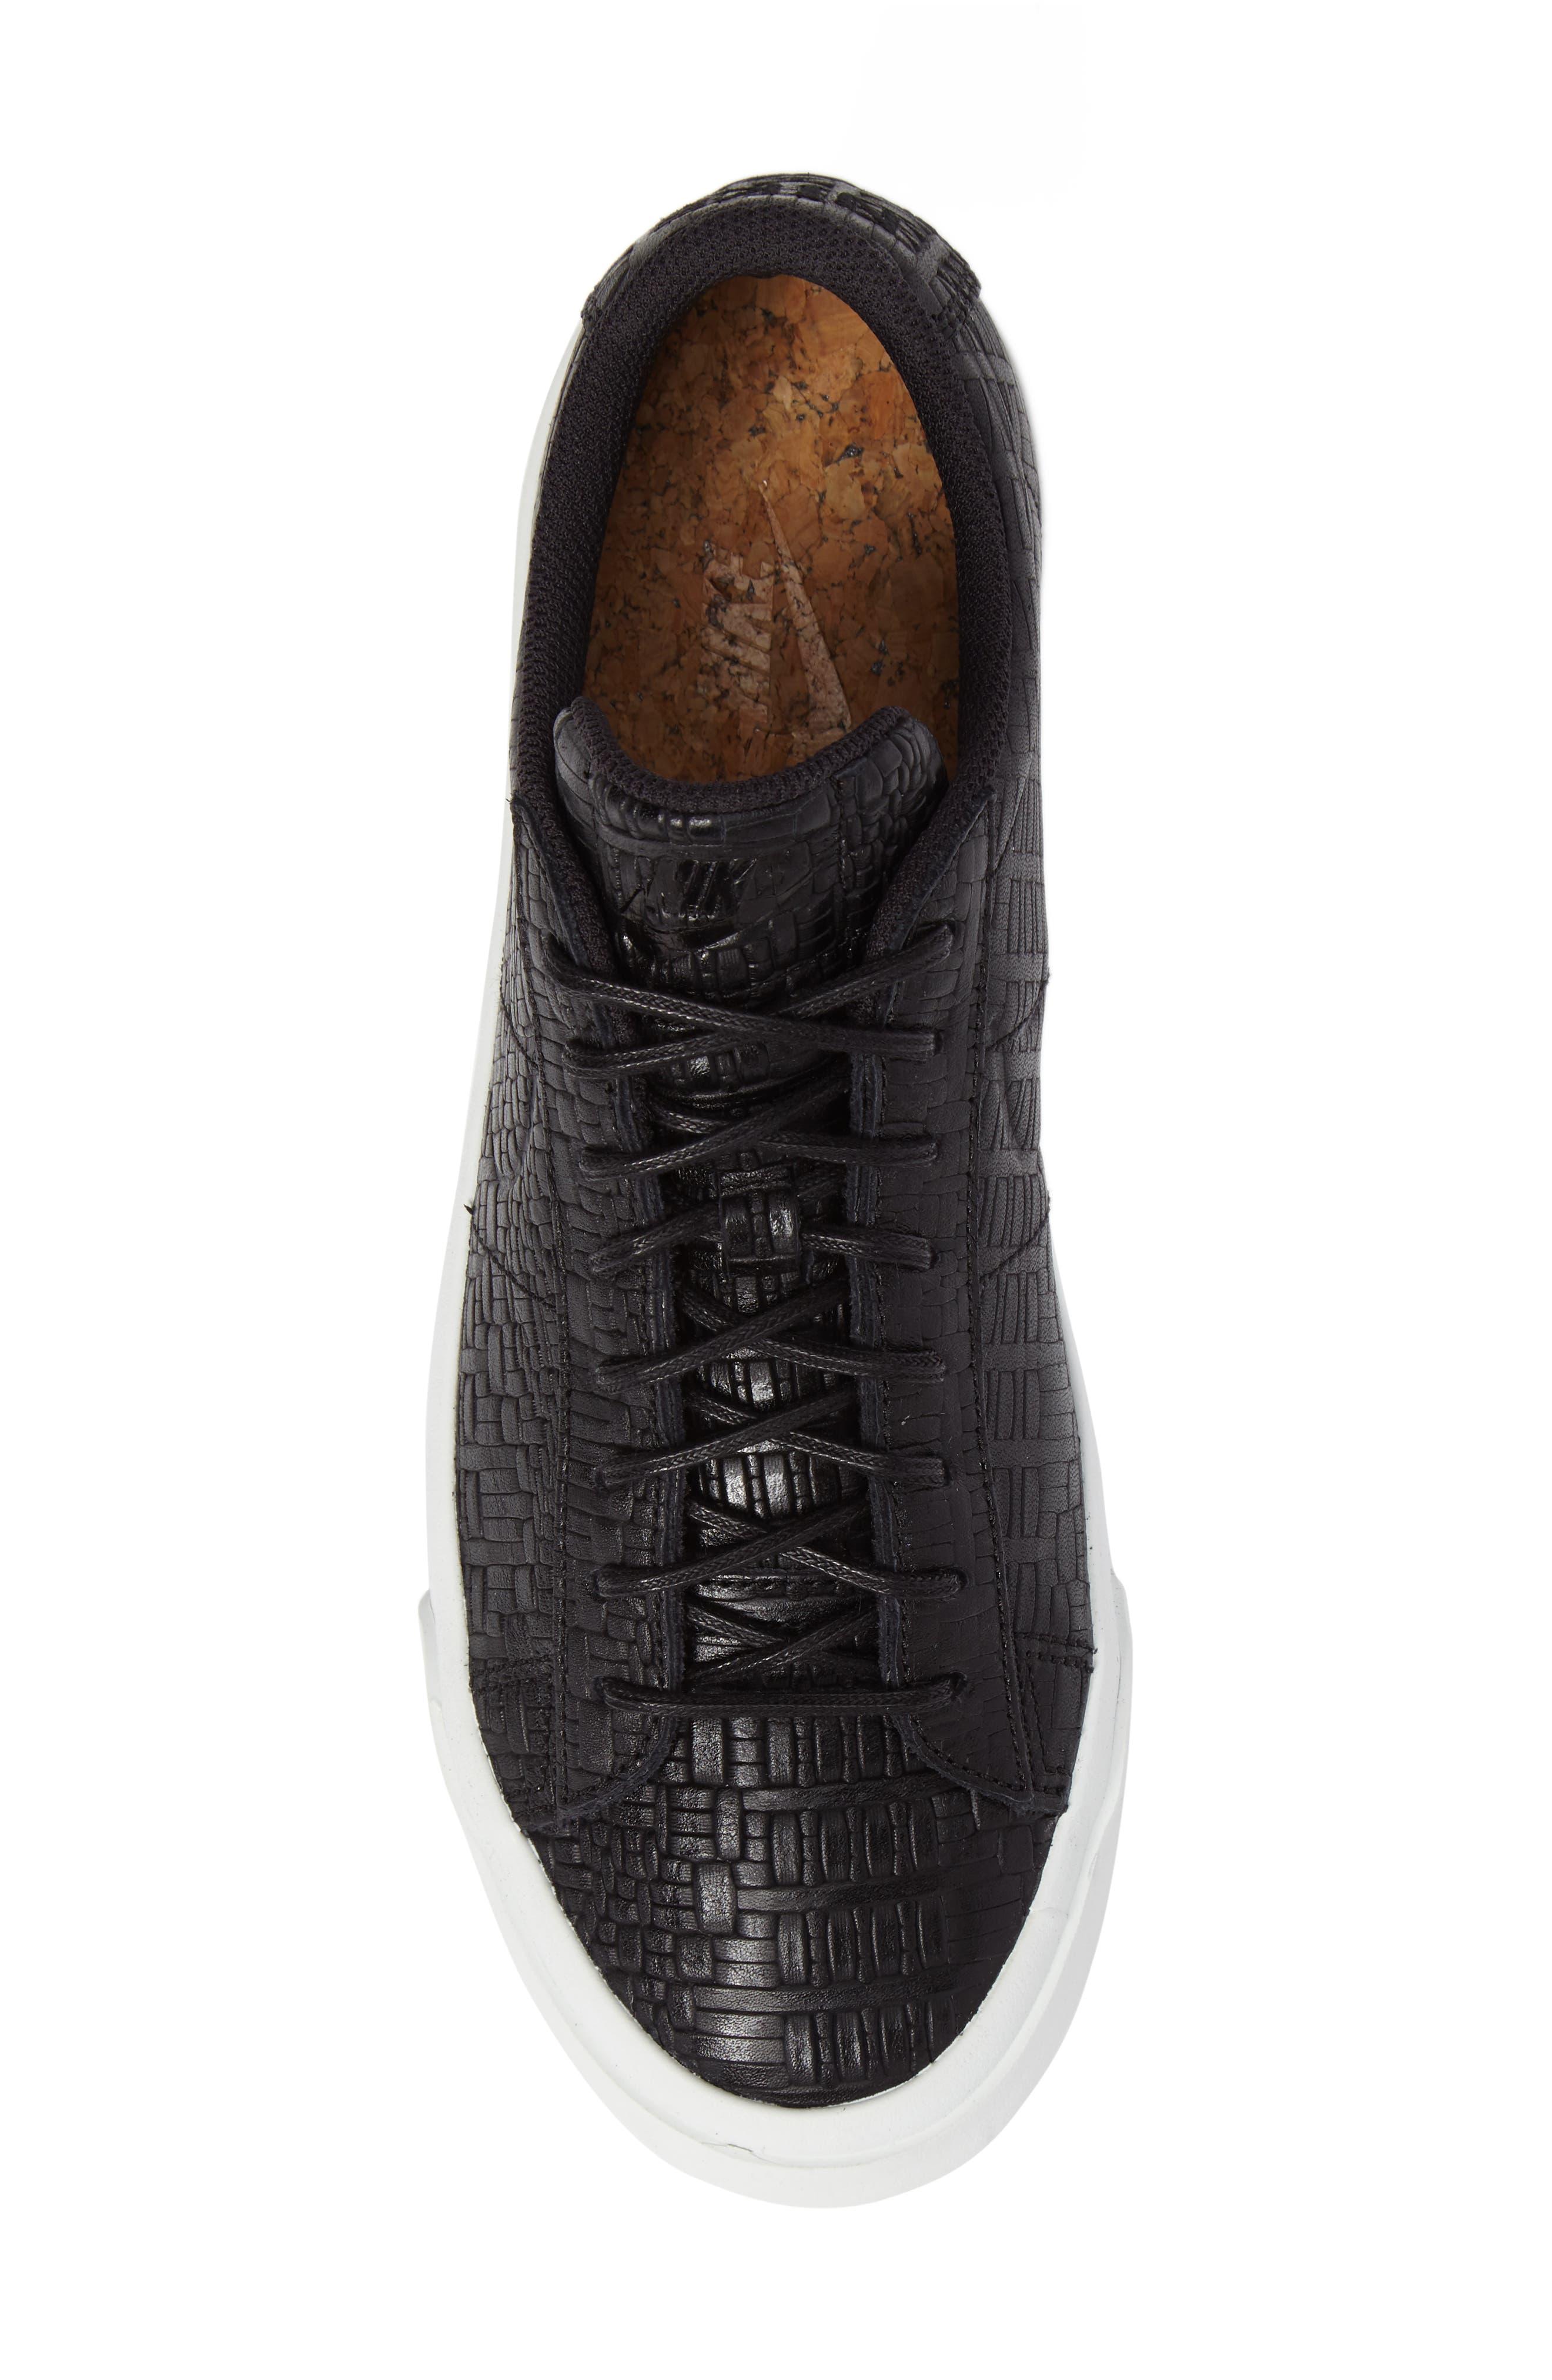 Blazer Studio Sneaker,                             Alternate thumbnail 5, color,                             001